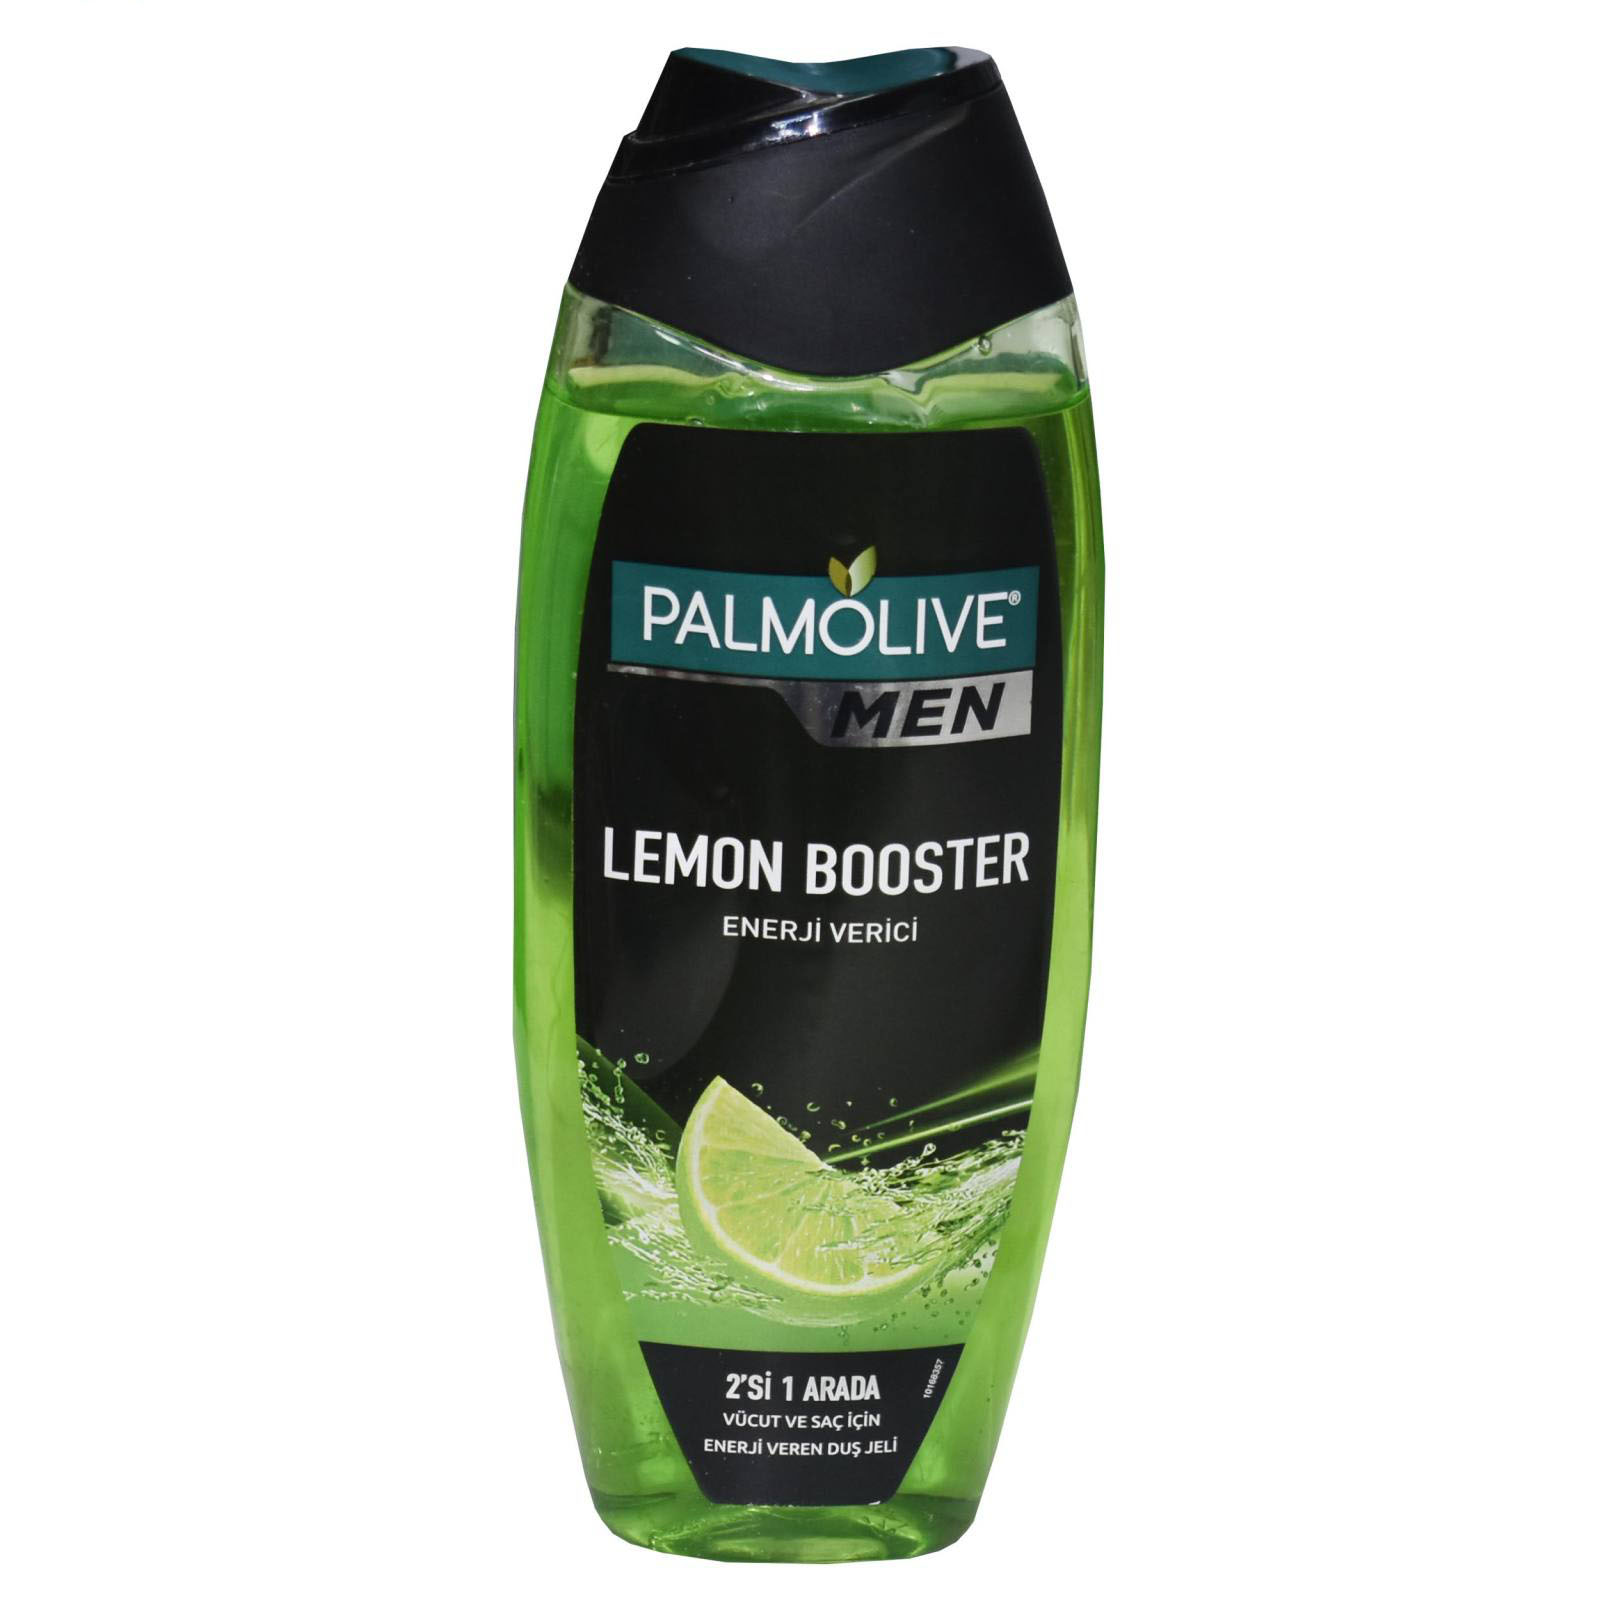 شامپو مو و بدن پالمولیو مدل Lemon booster حجم ۵۰۰ میلی لیتر